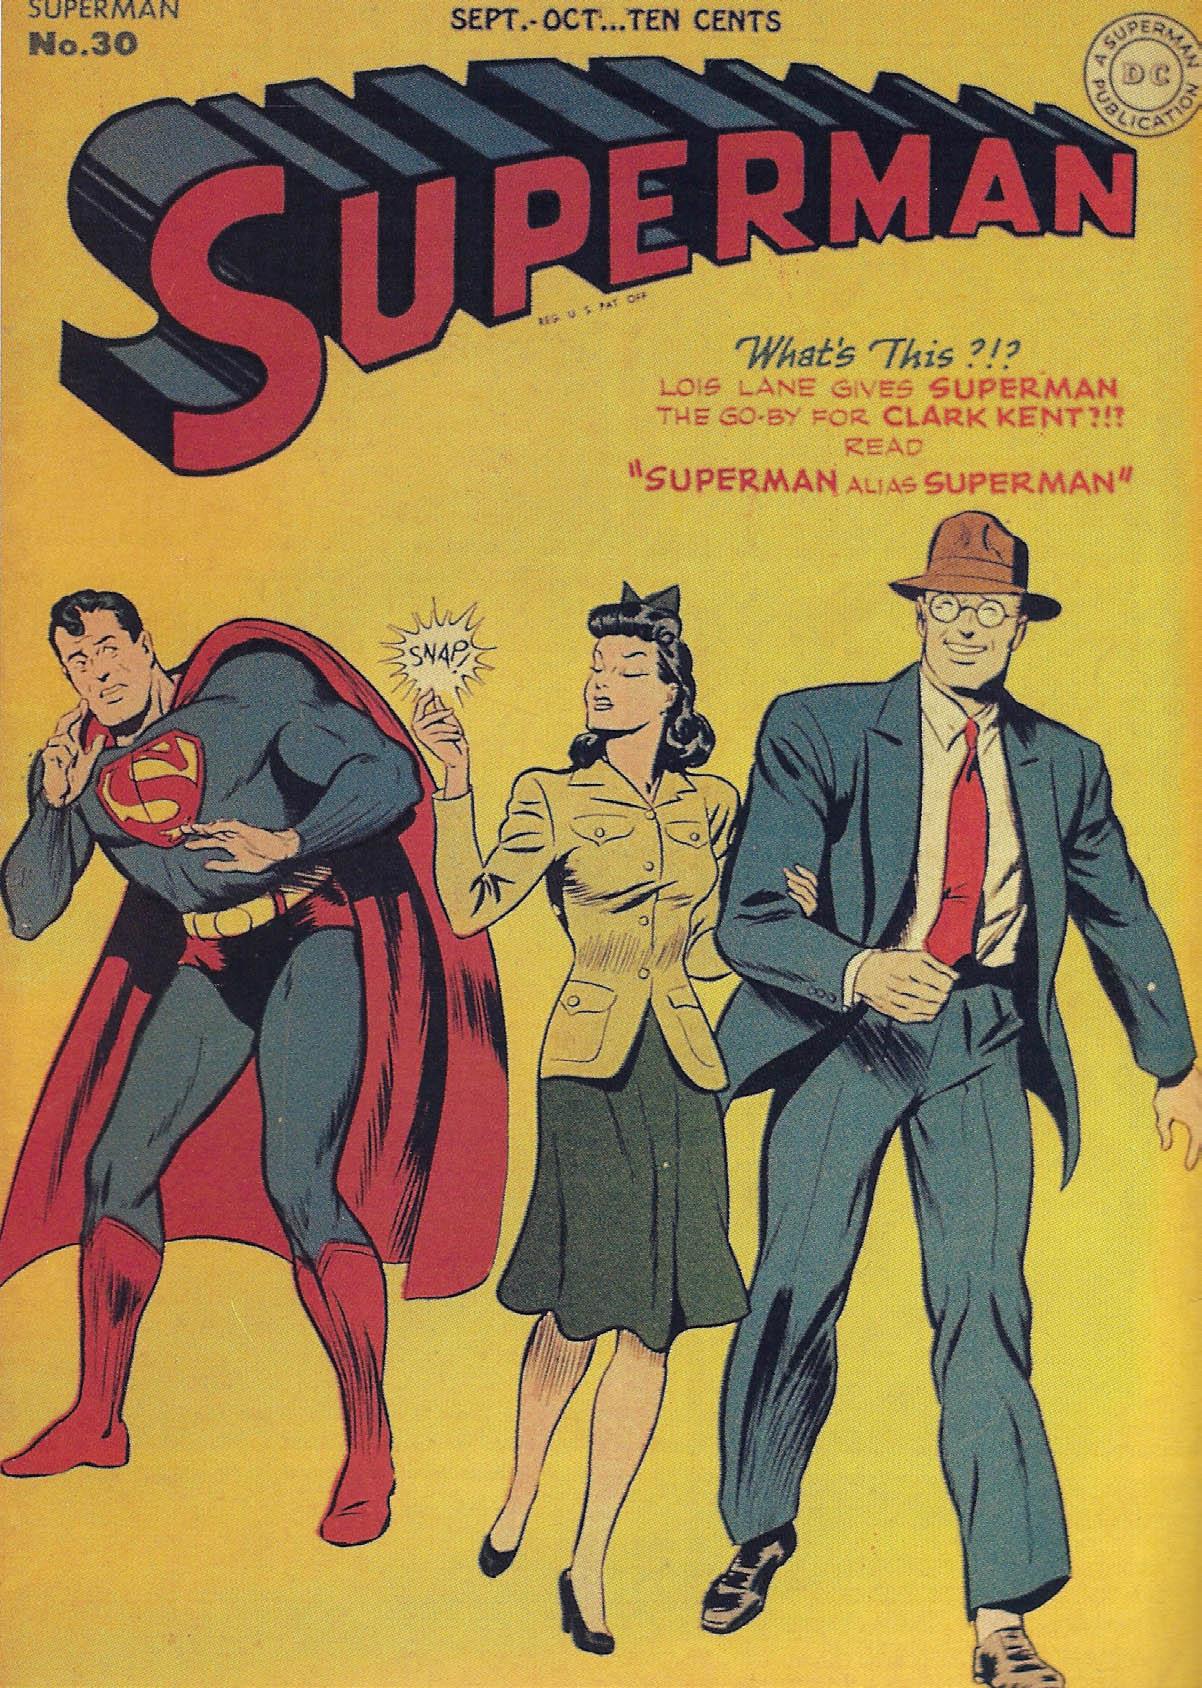 https://www.urban-comics.com/wp-content/uploads/2013/04/superman_44_cover.jpg